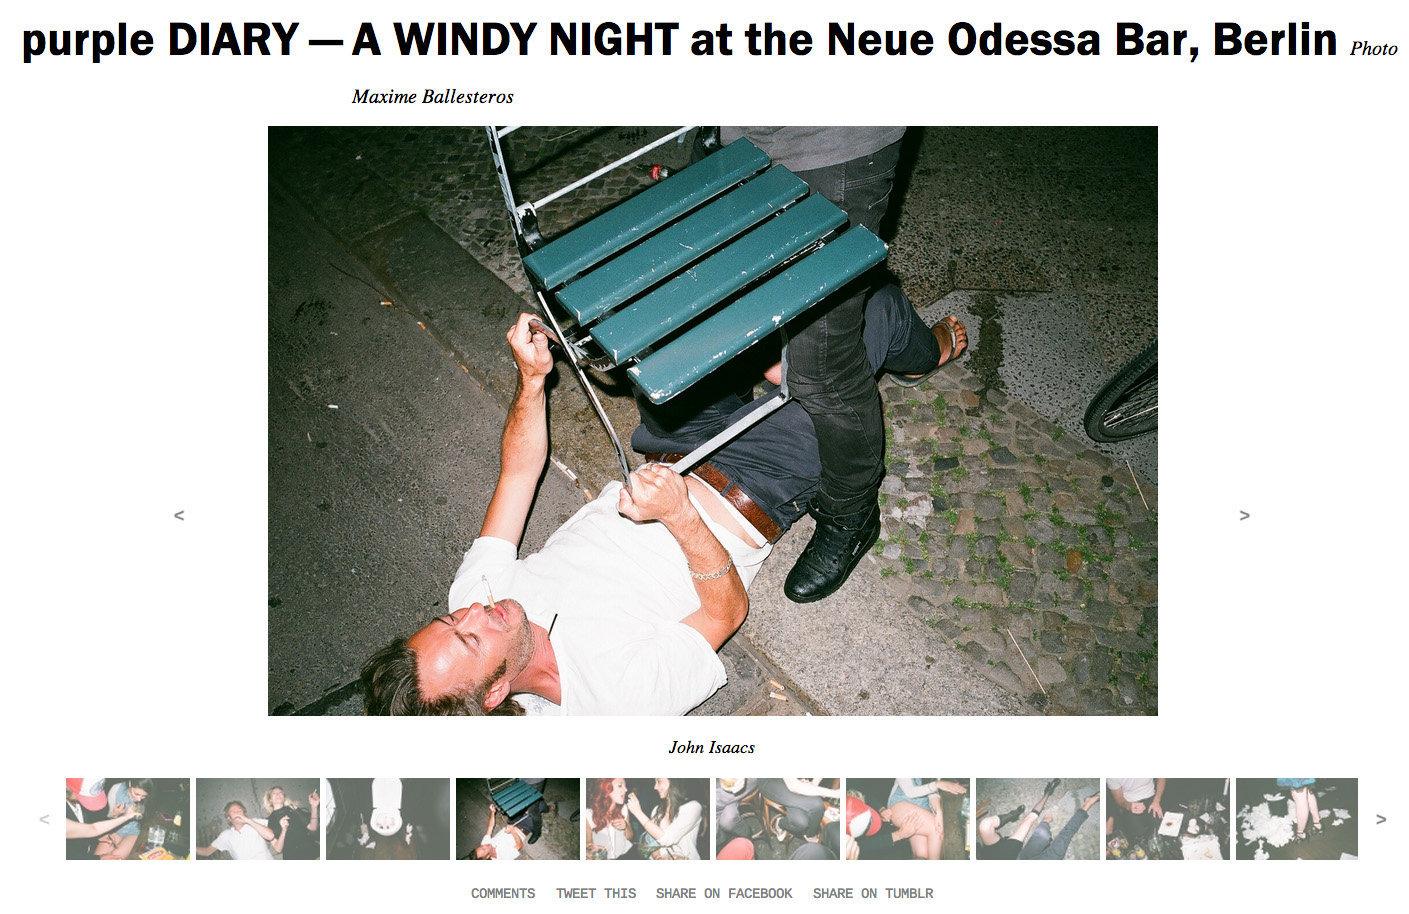 purple DIARY   A WINDY NIGHT at the Neue Odessa Bar  Berlin.jpg